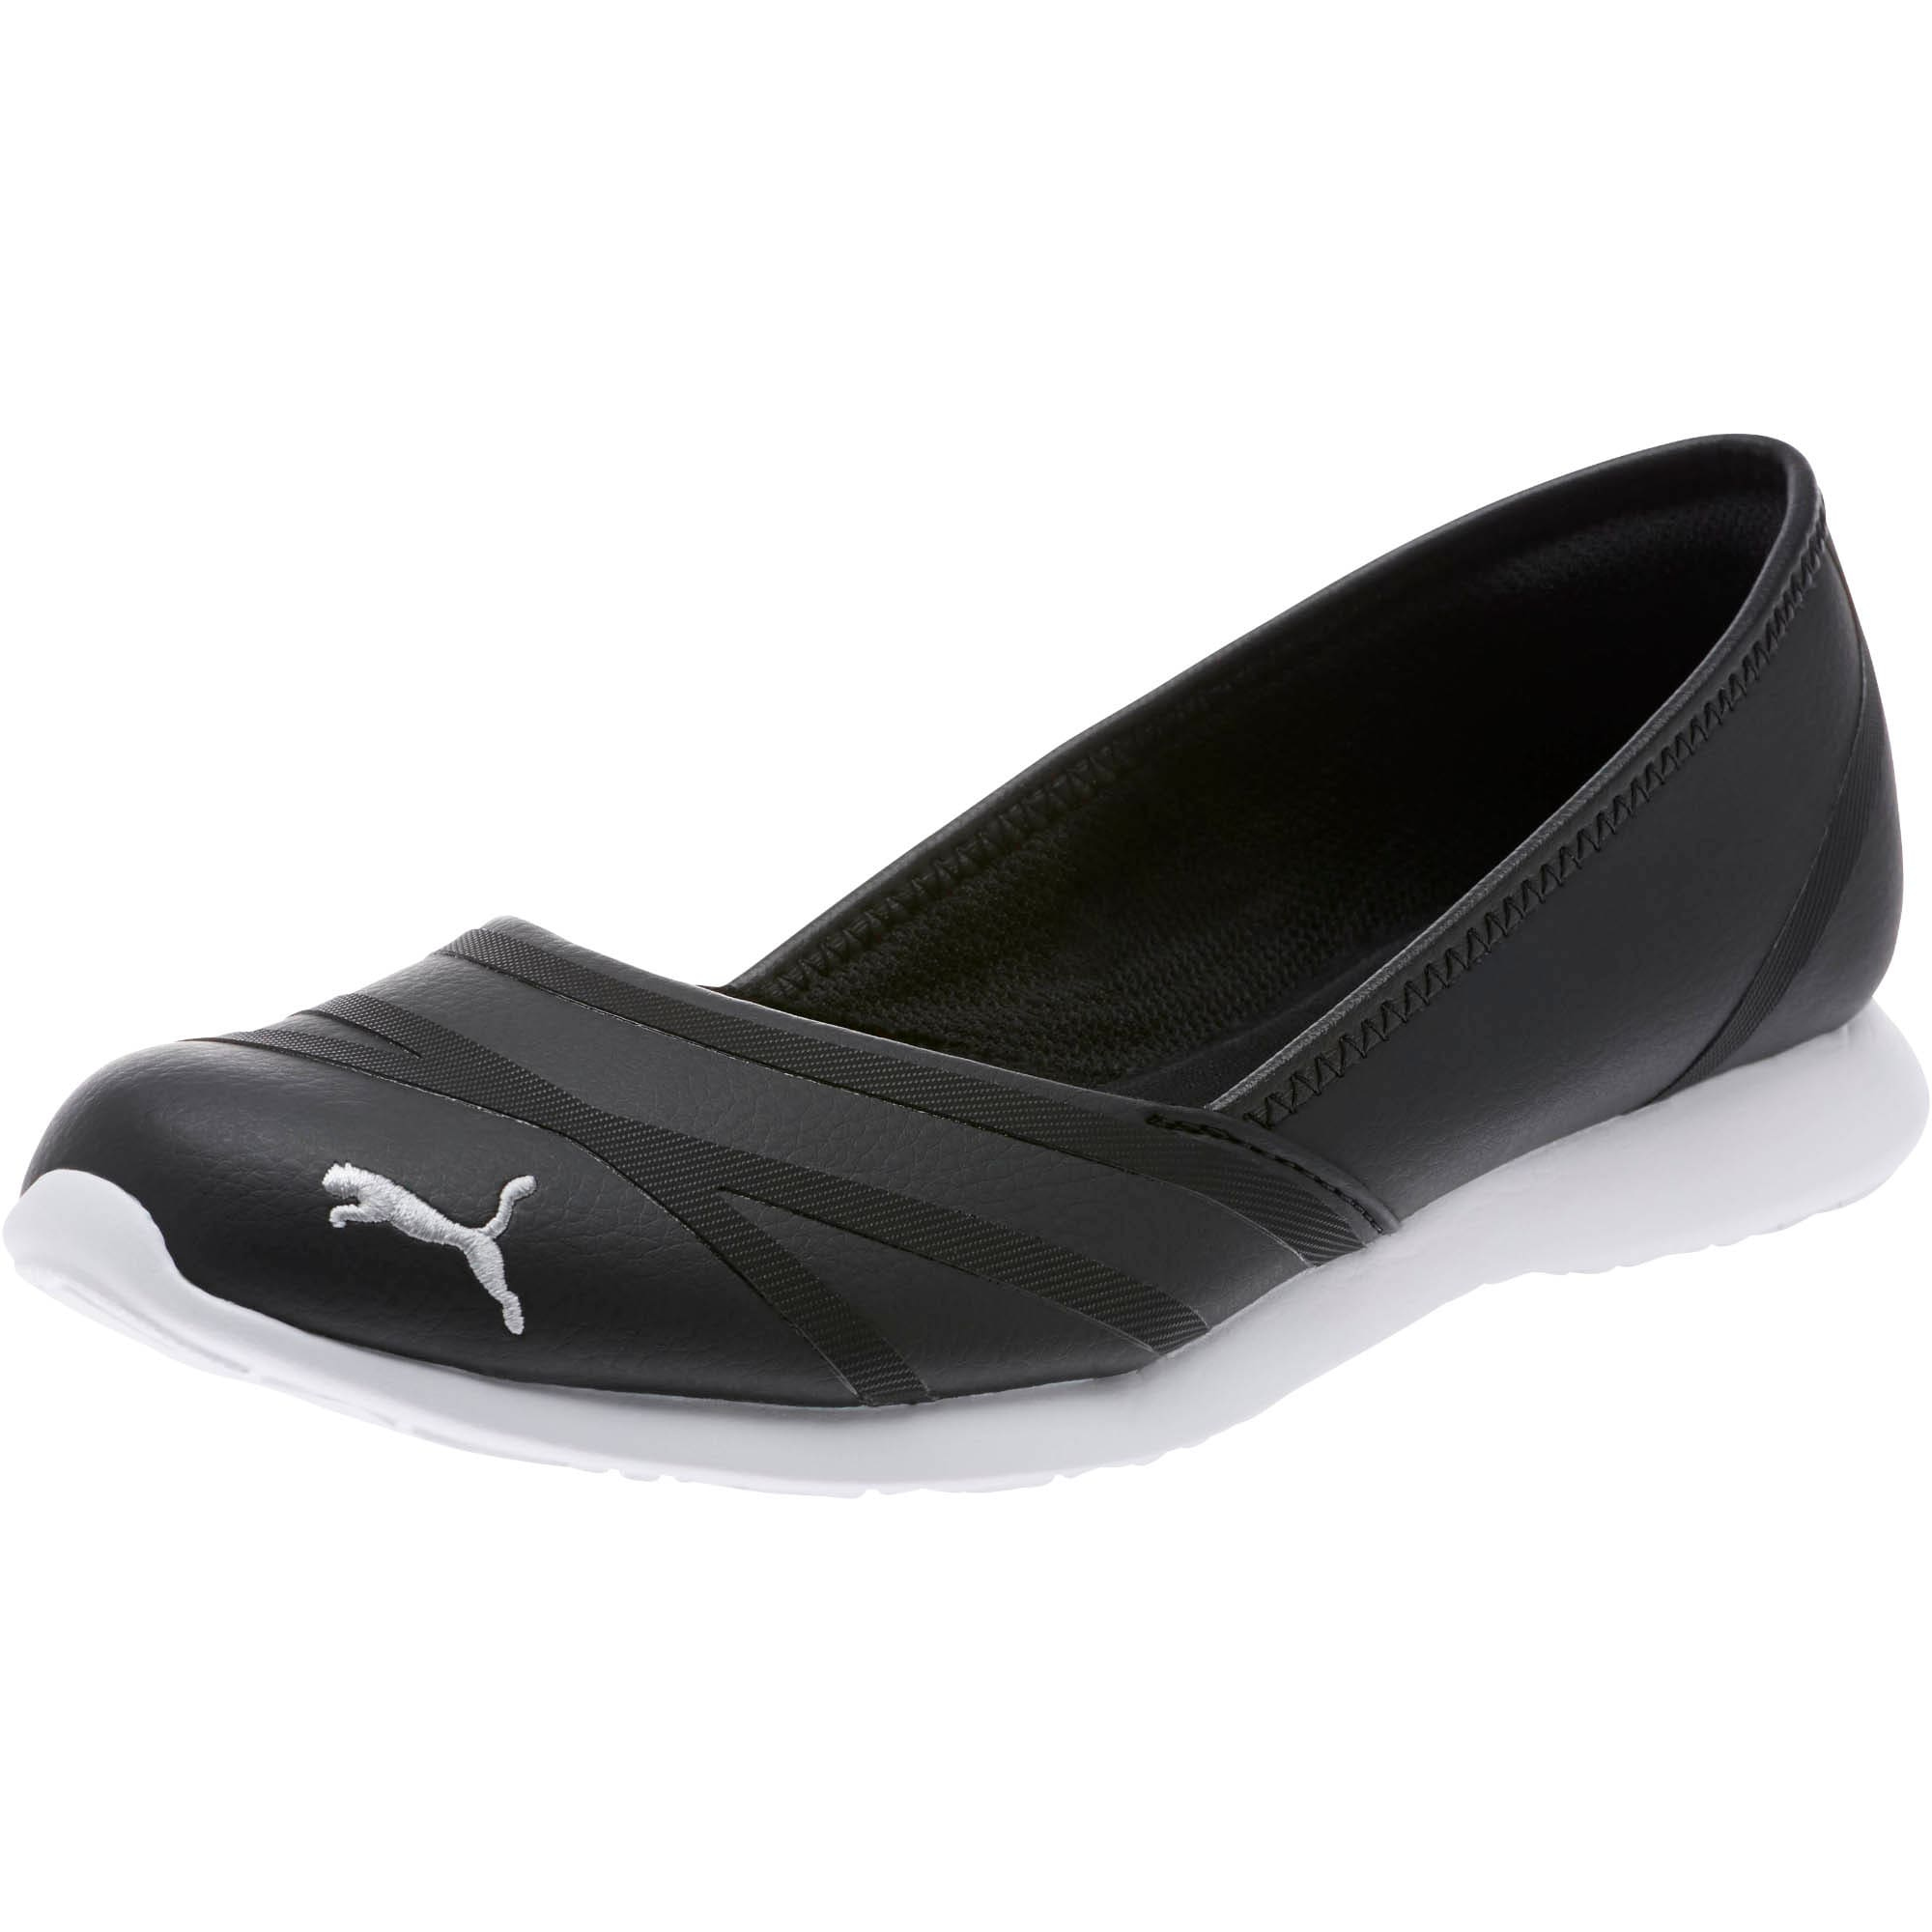 Thumbnail 1 of PUMA Vega Ballet Women's SL Shoes, Puma Black-Puma Black, medium